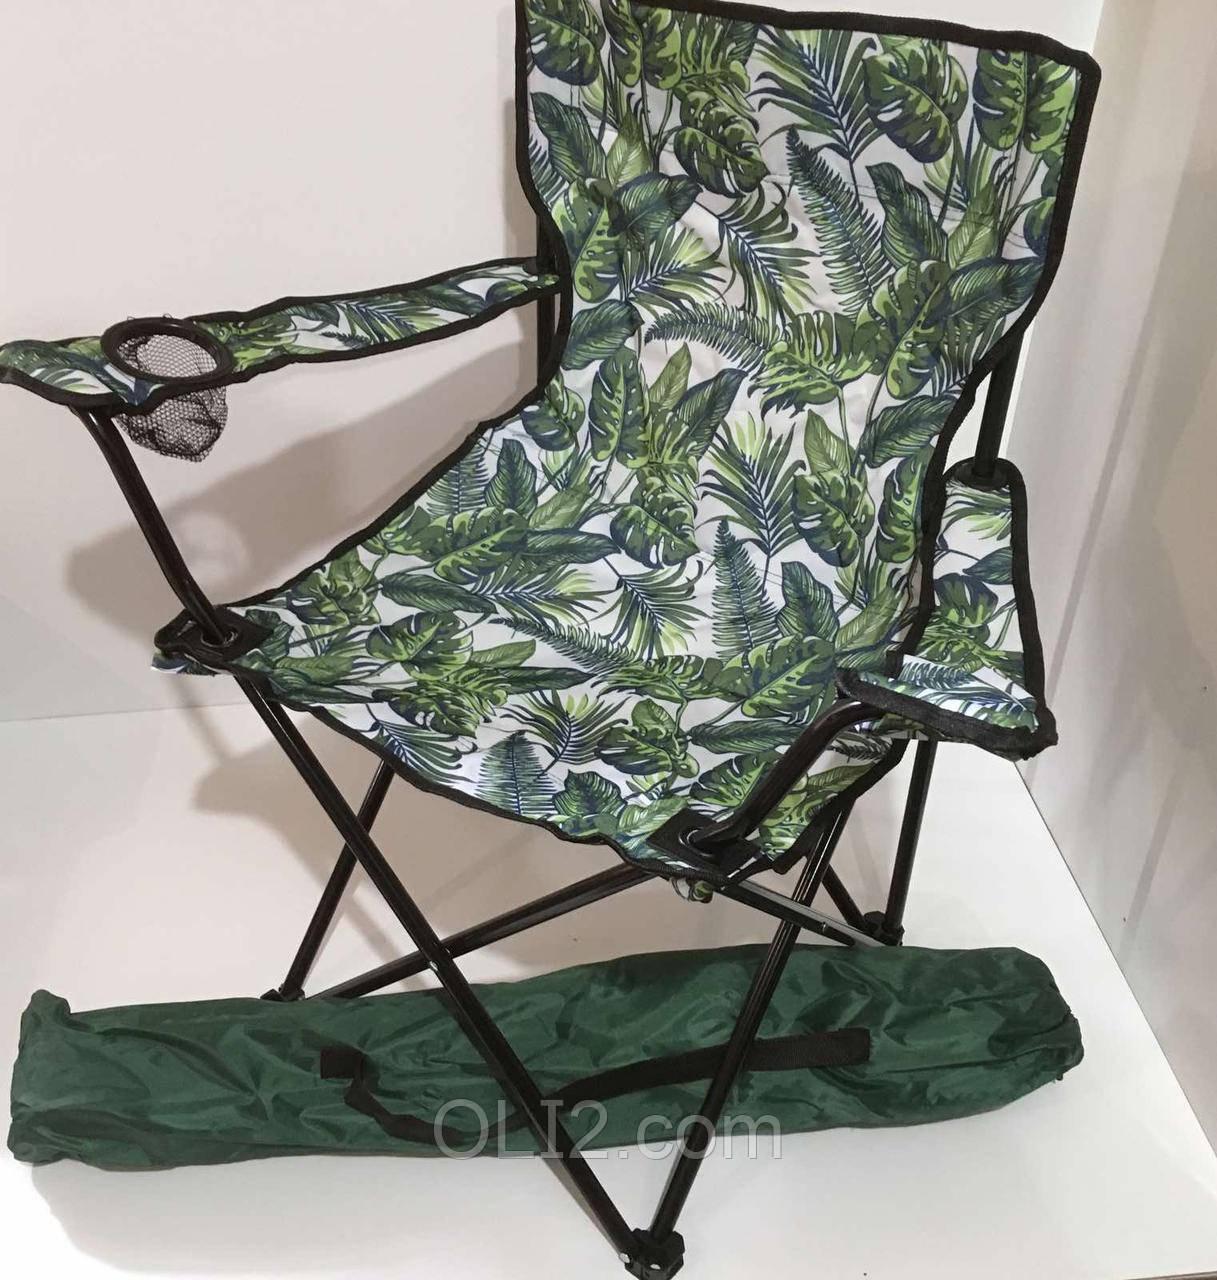 Складной  стул для пикника,рыбалки Styleberg 50/50/80см